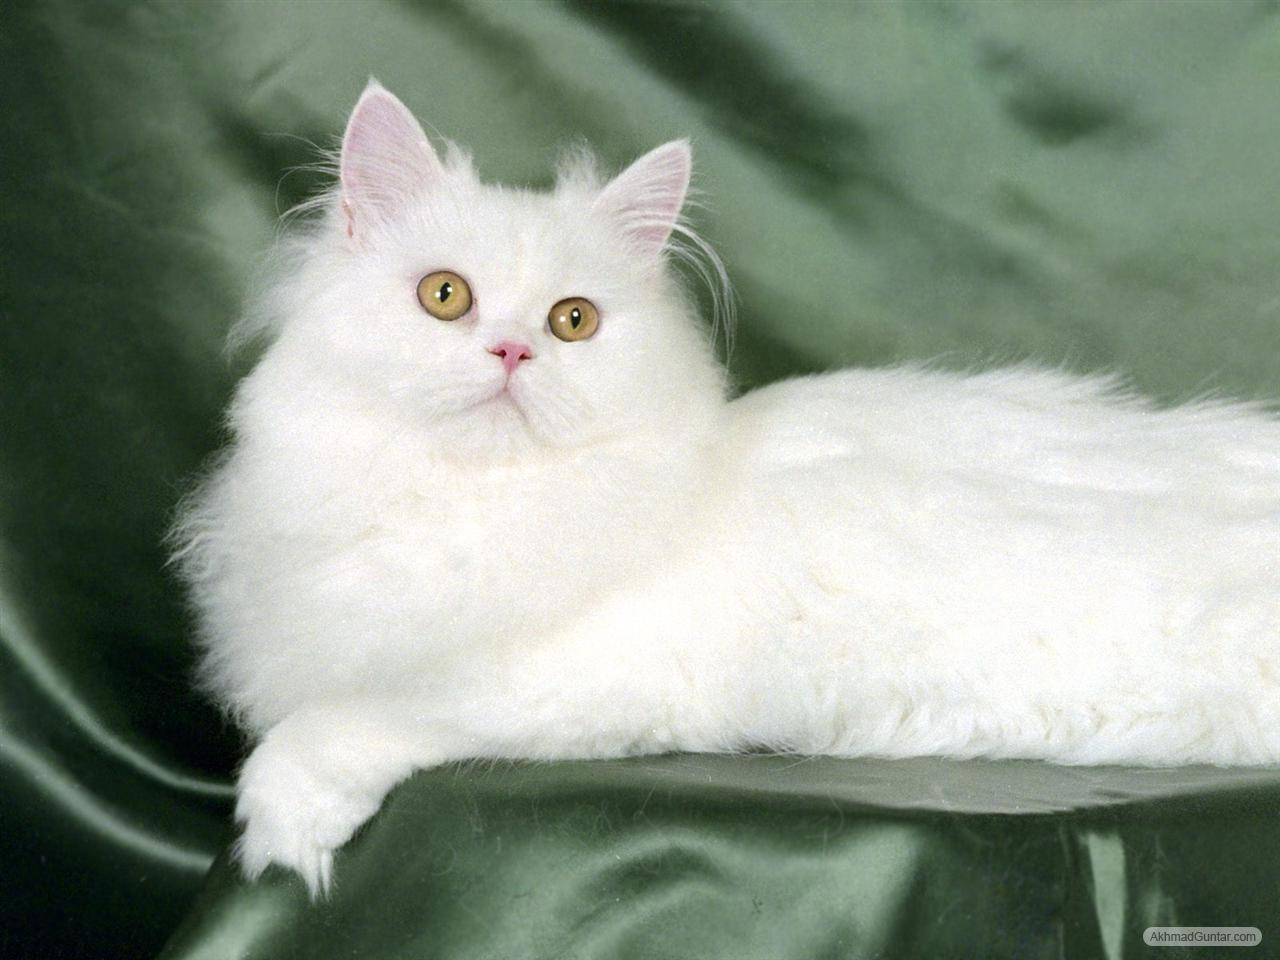 Perawatan Kucing Kucing Putih Imut Bersih Sempurna